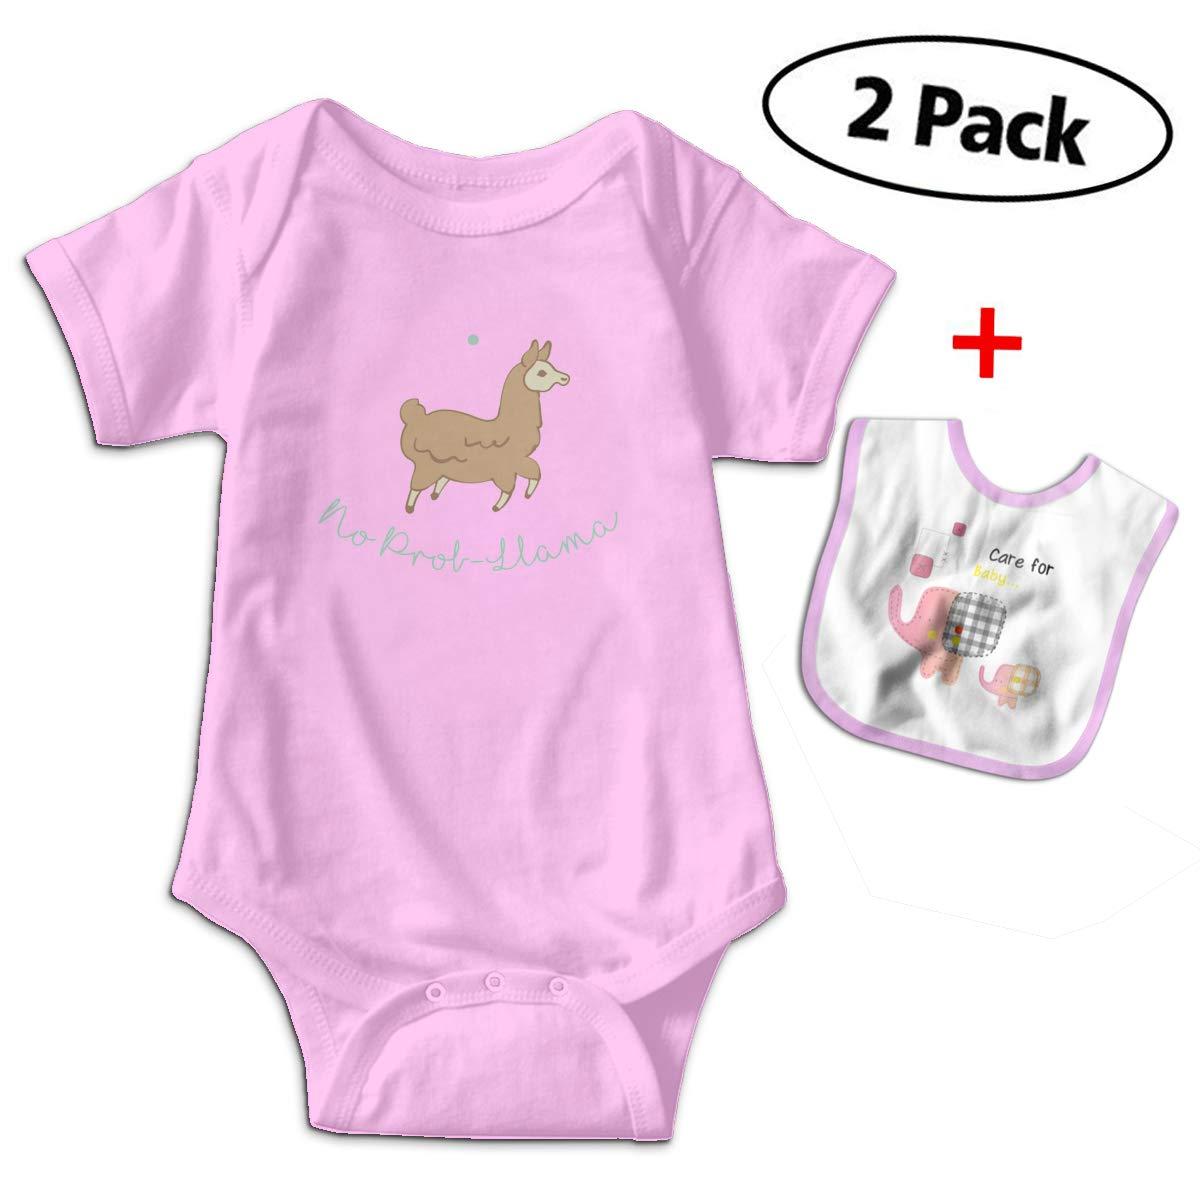 No Prob- Llama Baby Bodysuits Funny Short Sleeve Boy Girl